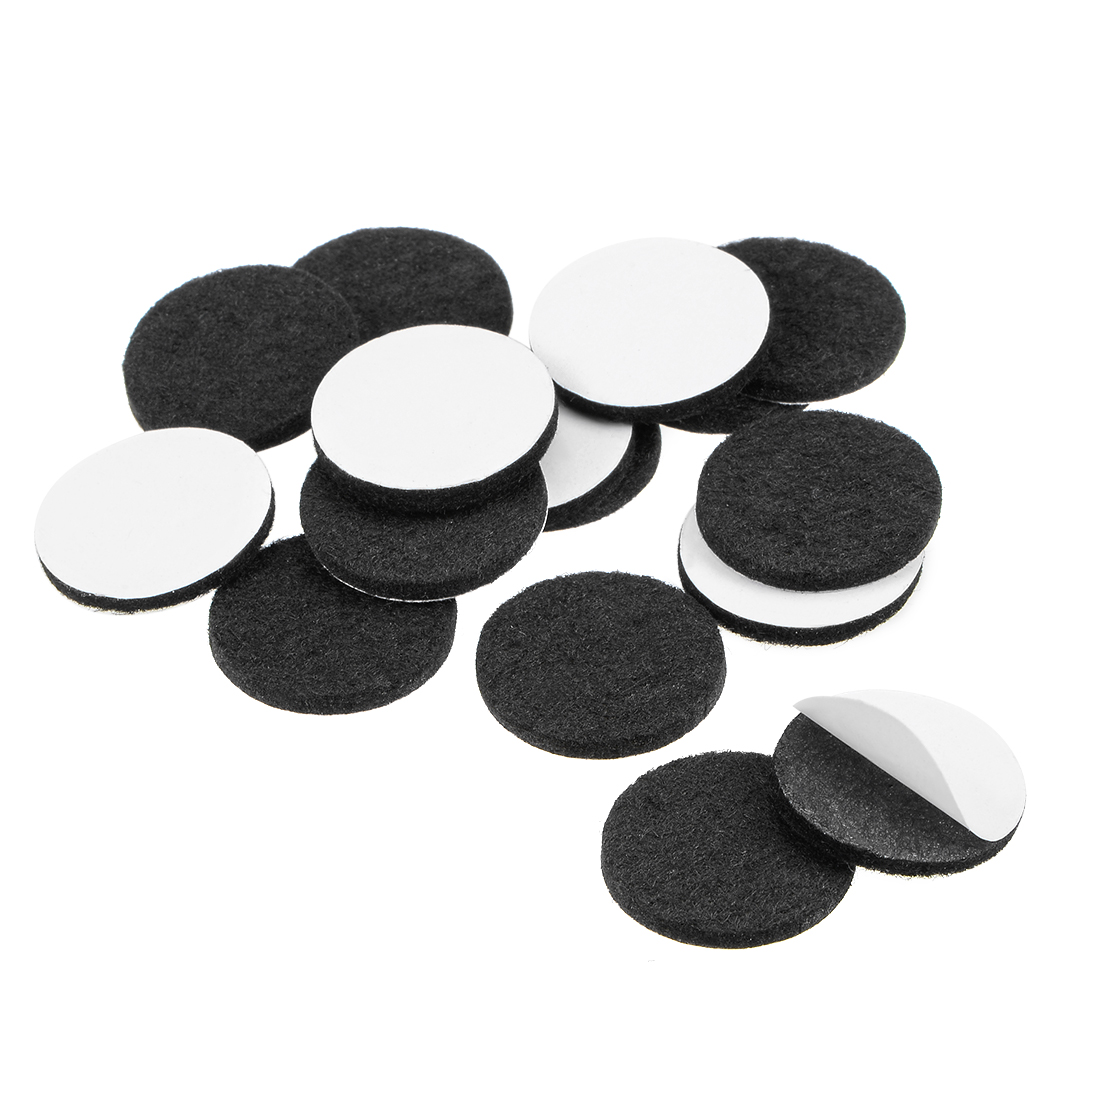 Furniture Pads Adhesive Felt Pads 25mm Diameter 3mm Thick Round Black 16Pcs